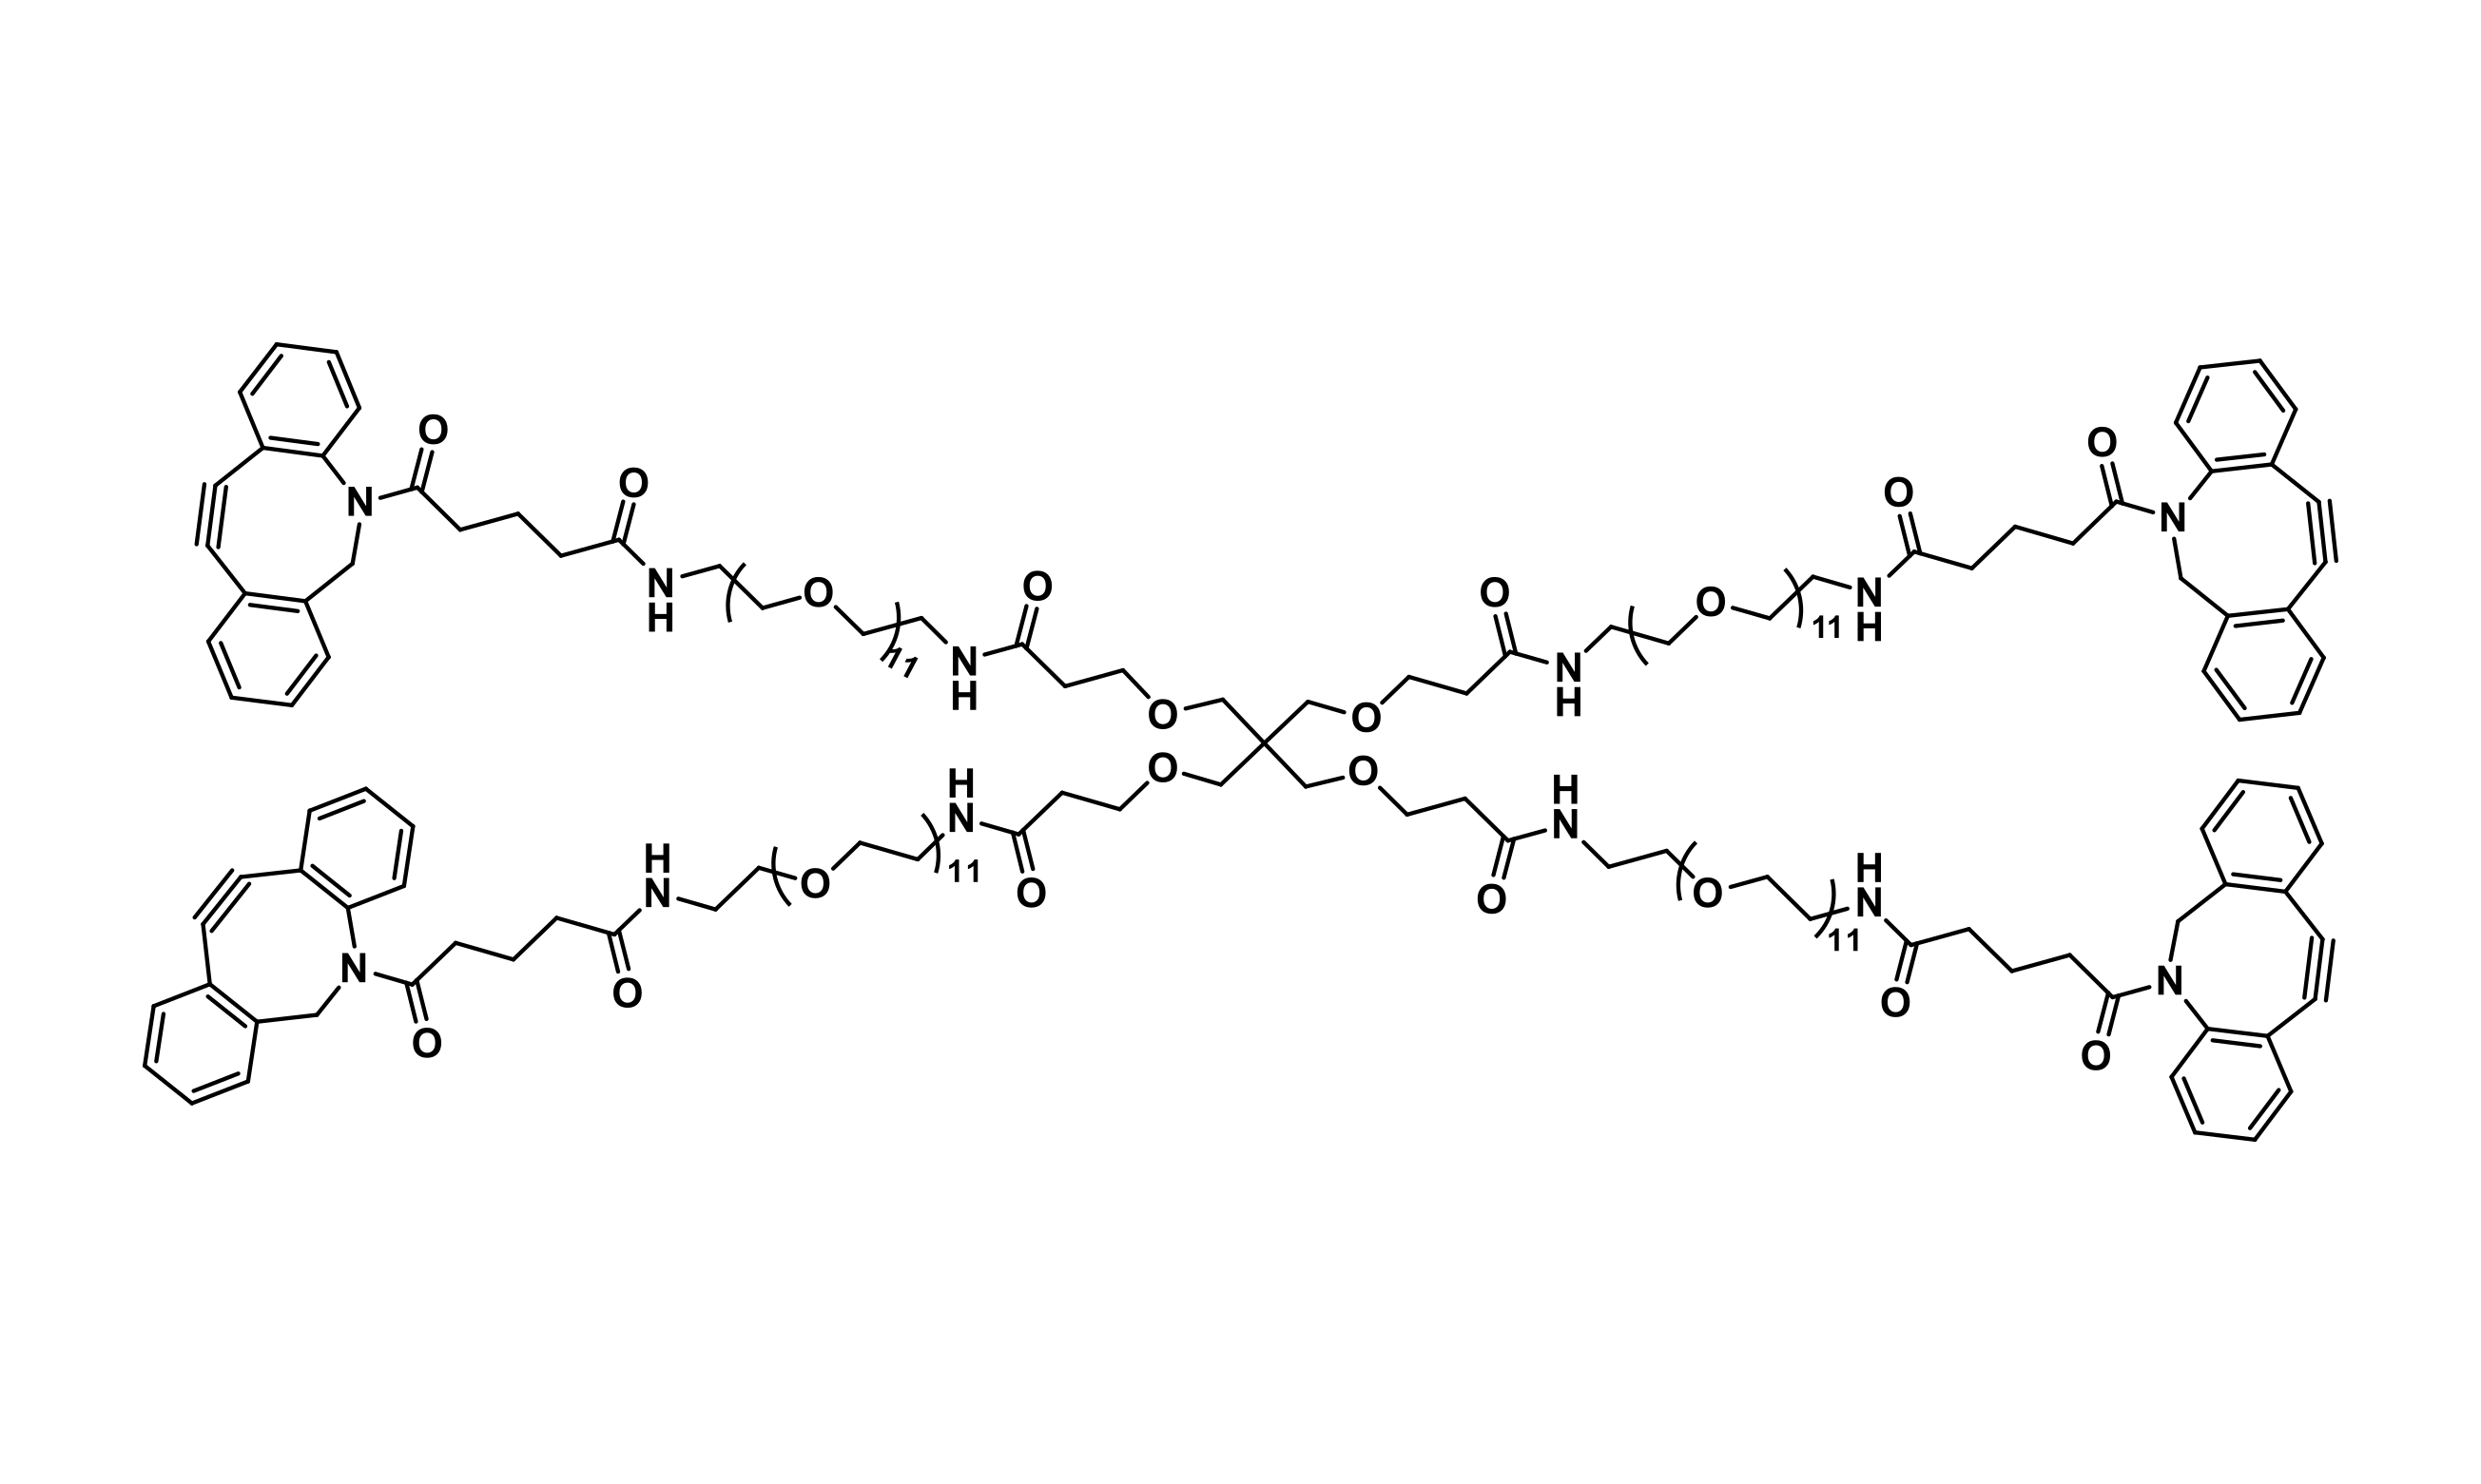 Tetra(-dPEG®₁₁-DBCO)pentaerythritol